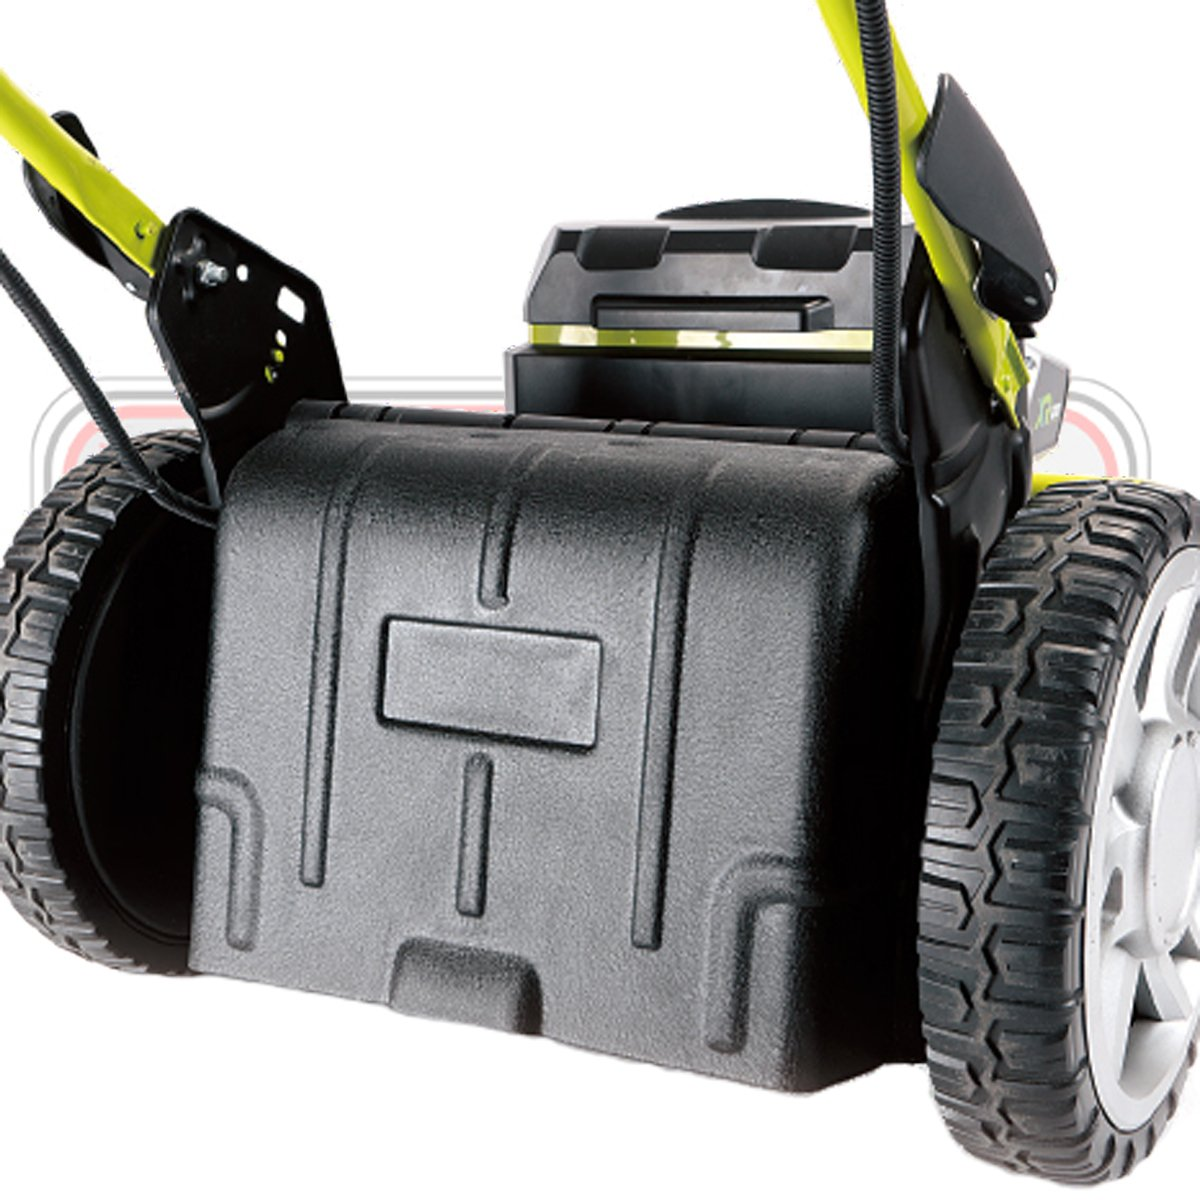 cortacesped bateria traccion autopropulsado G-Force XR 120 LM 46 SP